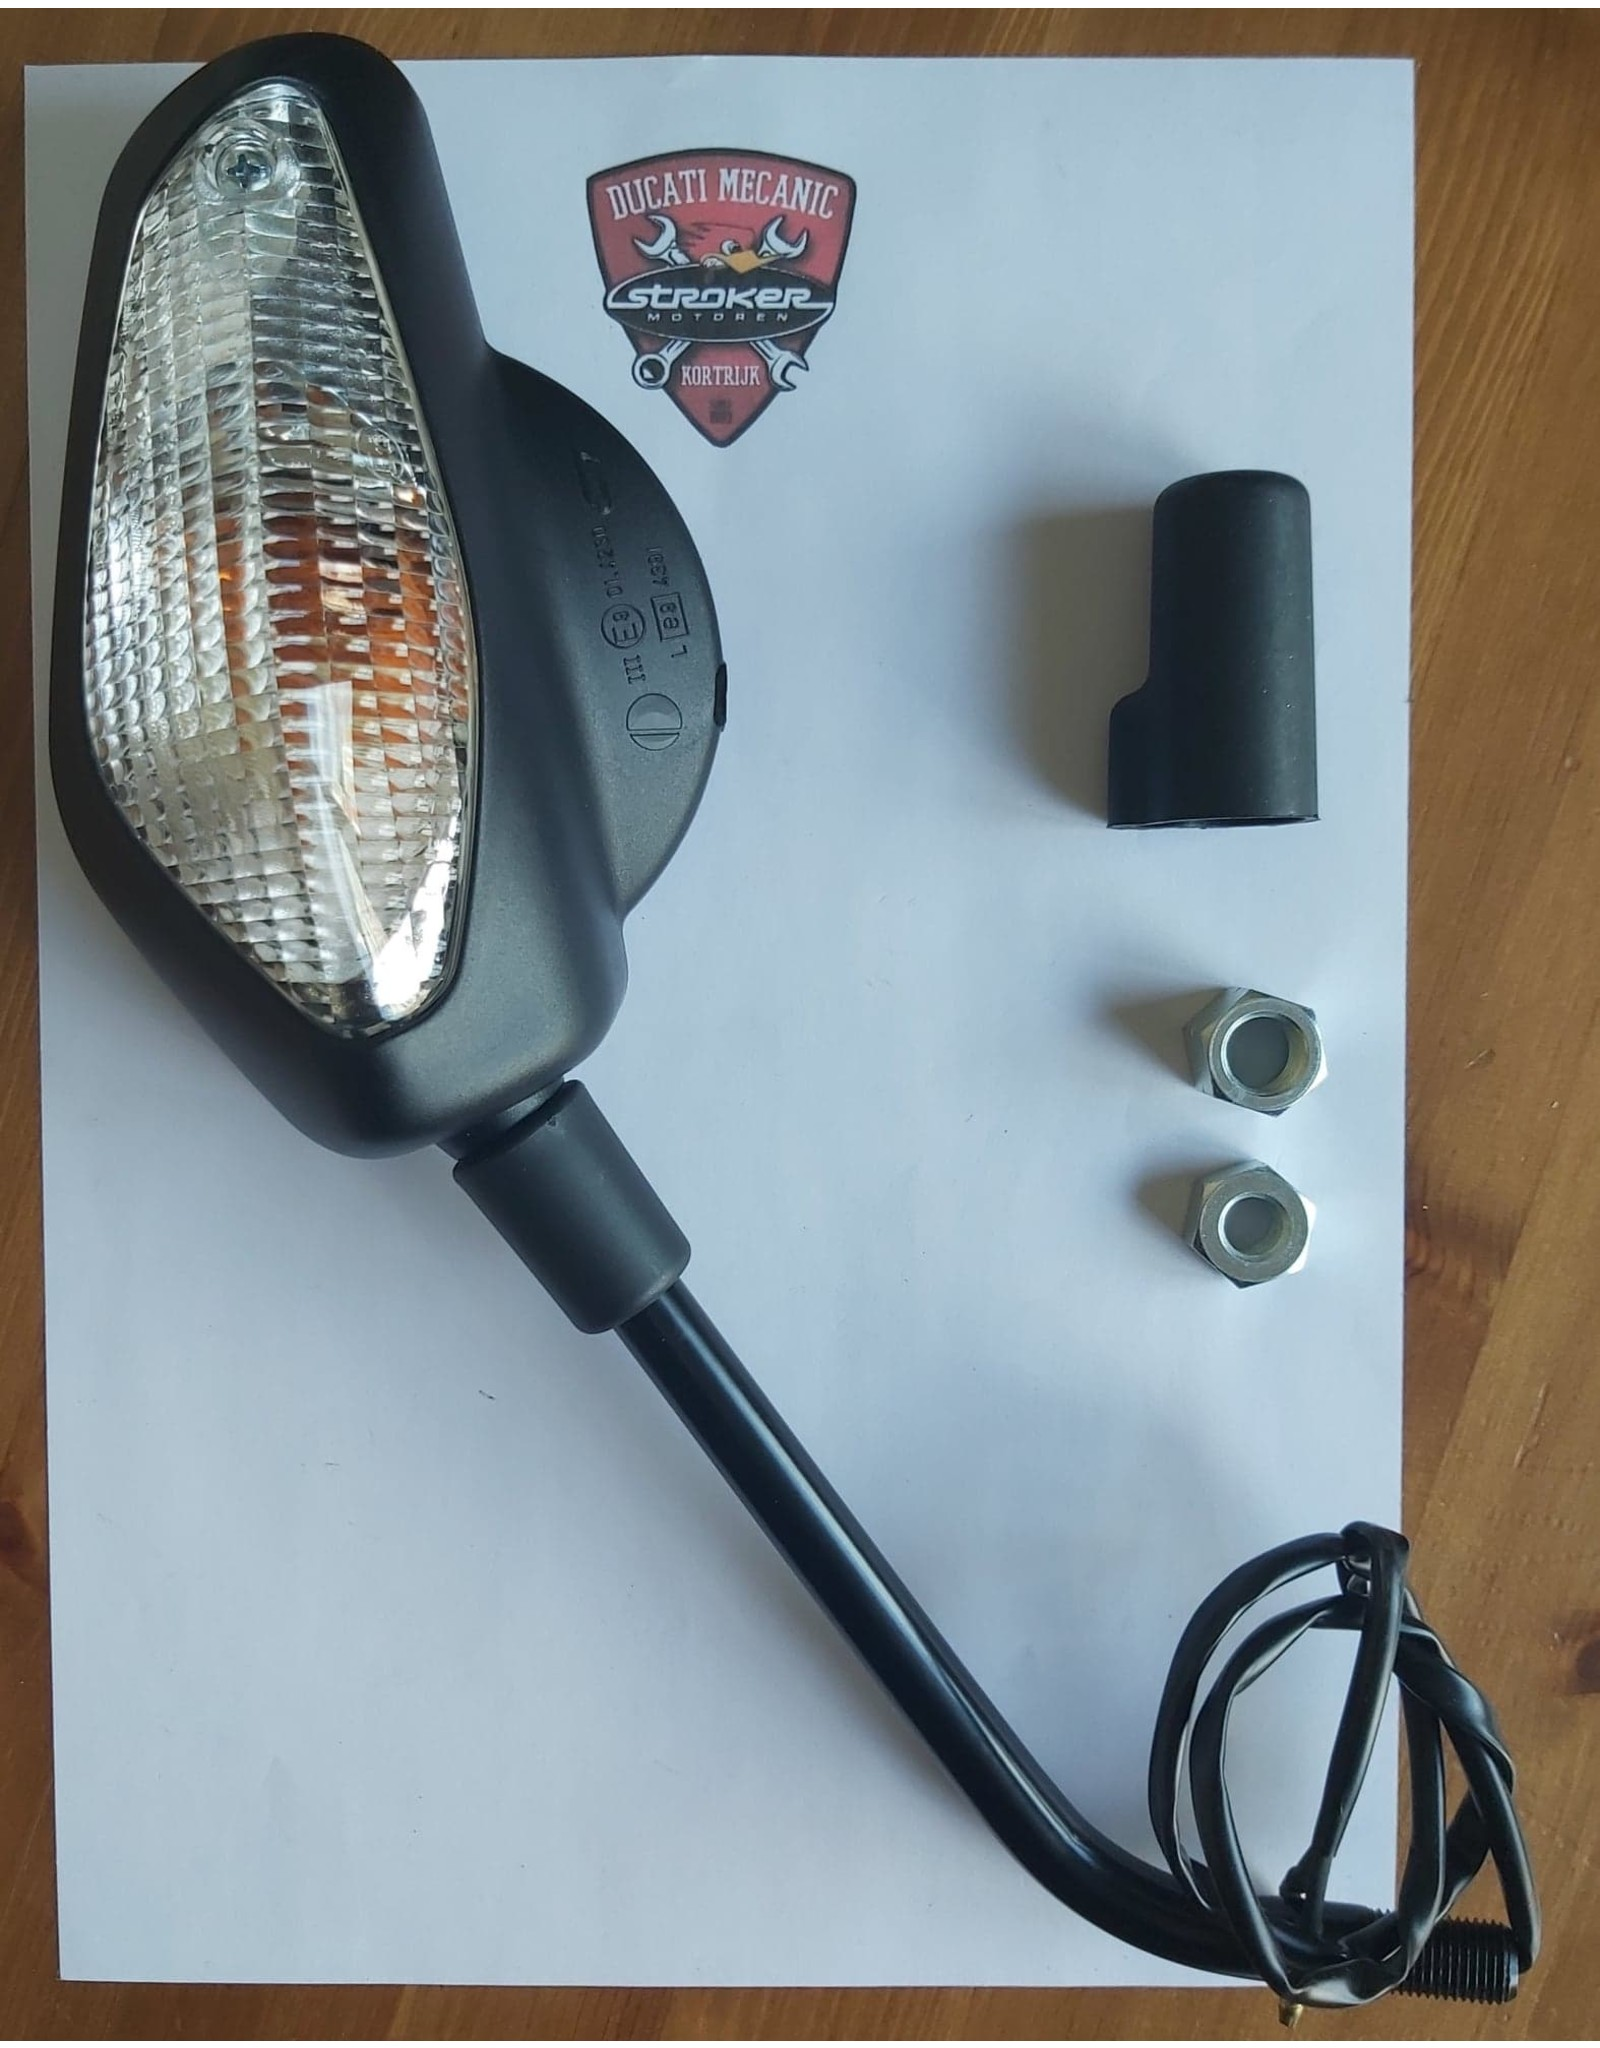 Ducati Ducati Mutistrada 620 1000 1100 LH Mirror 52320141C